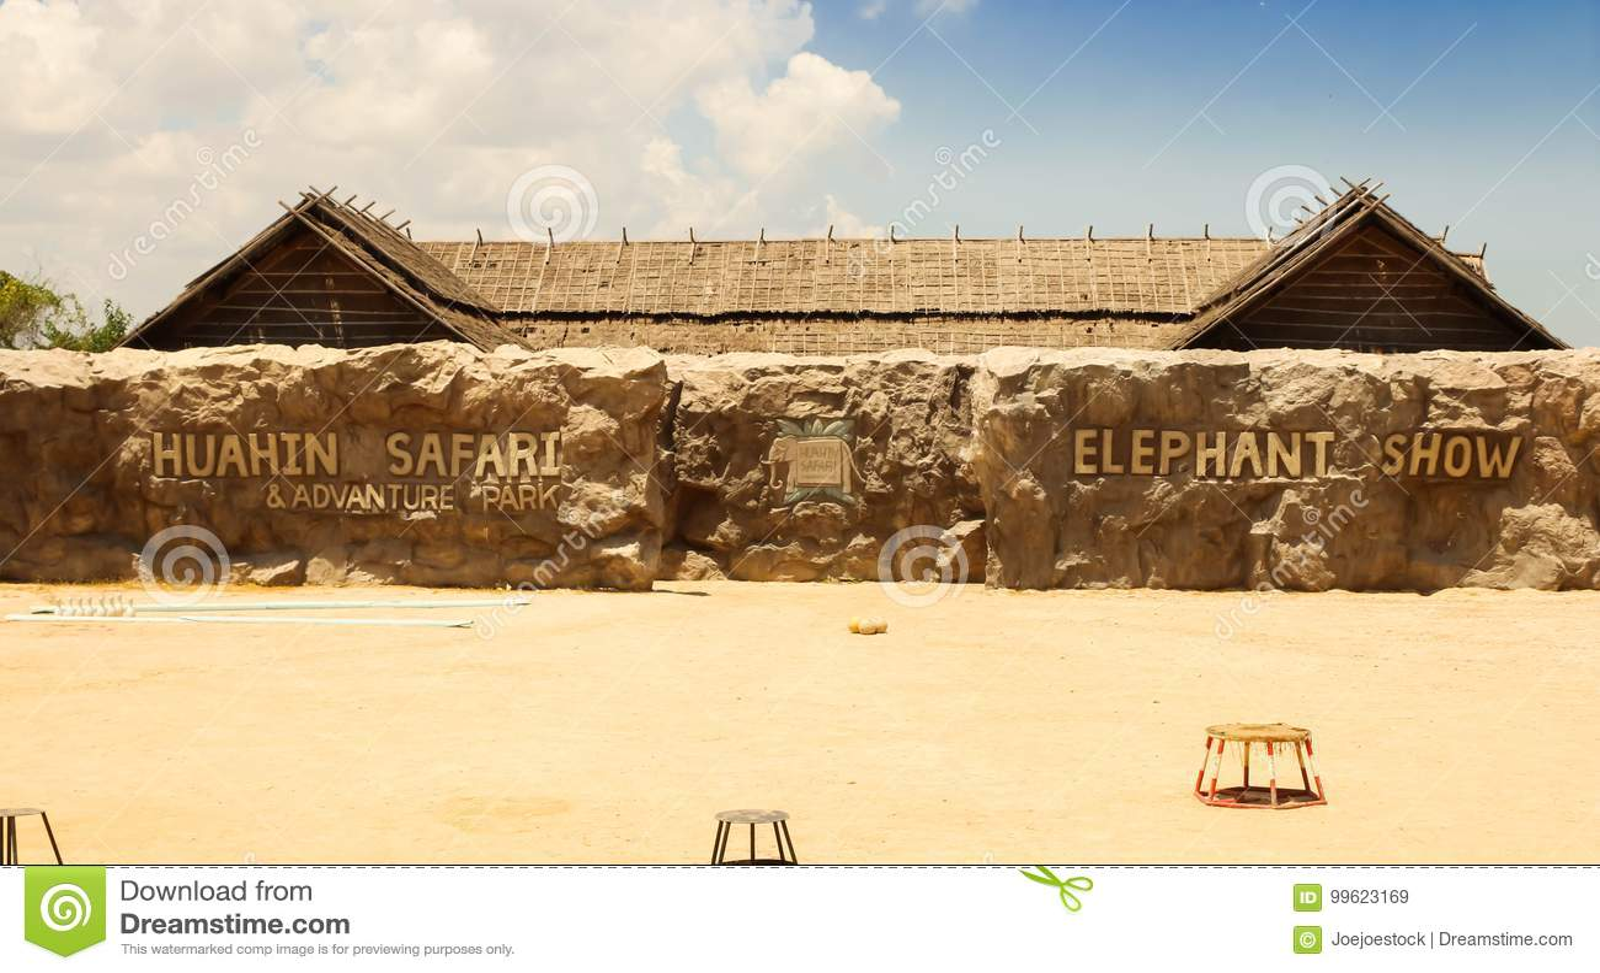 Editorial-Elephant show at HuaHin Safari,Thailand